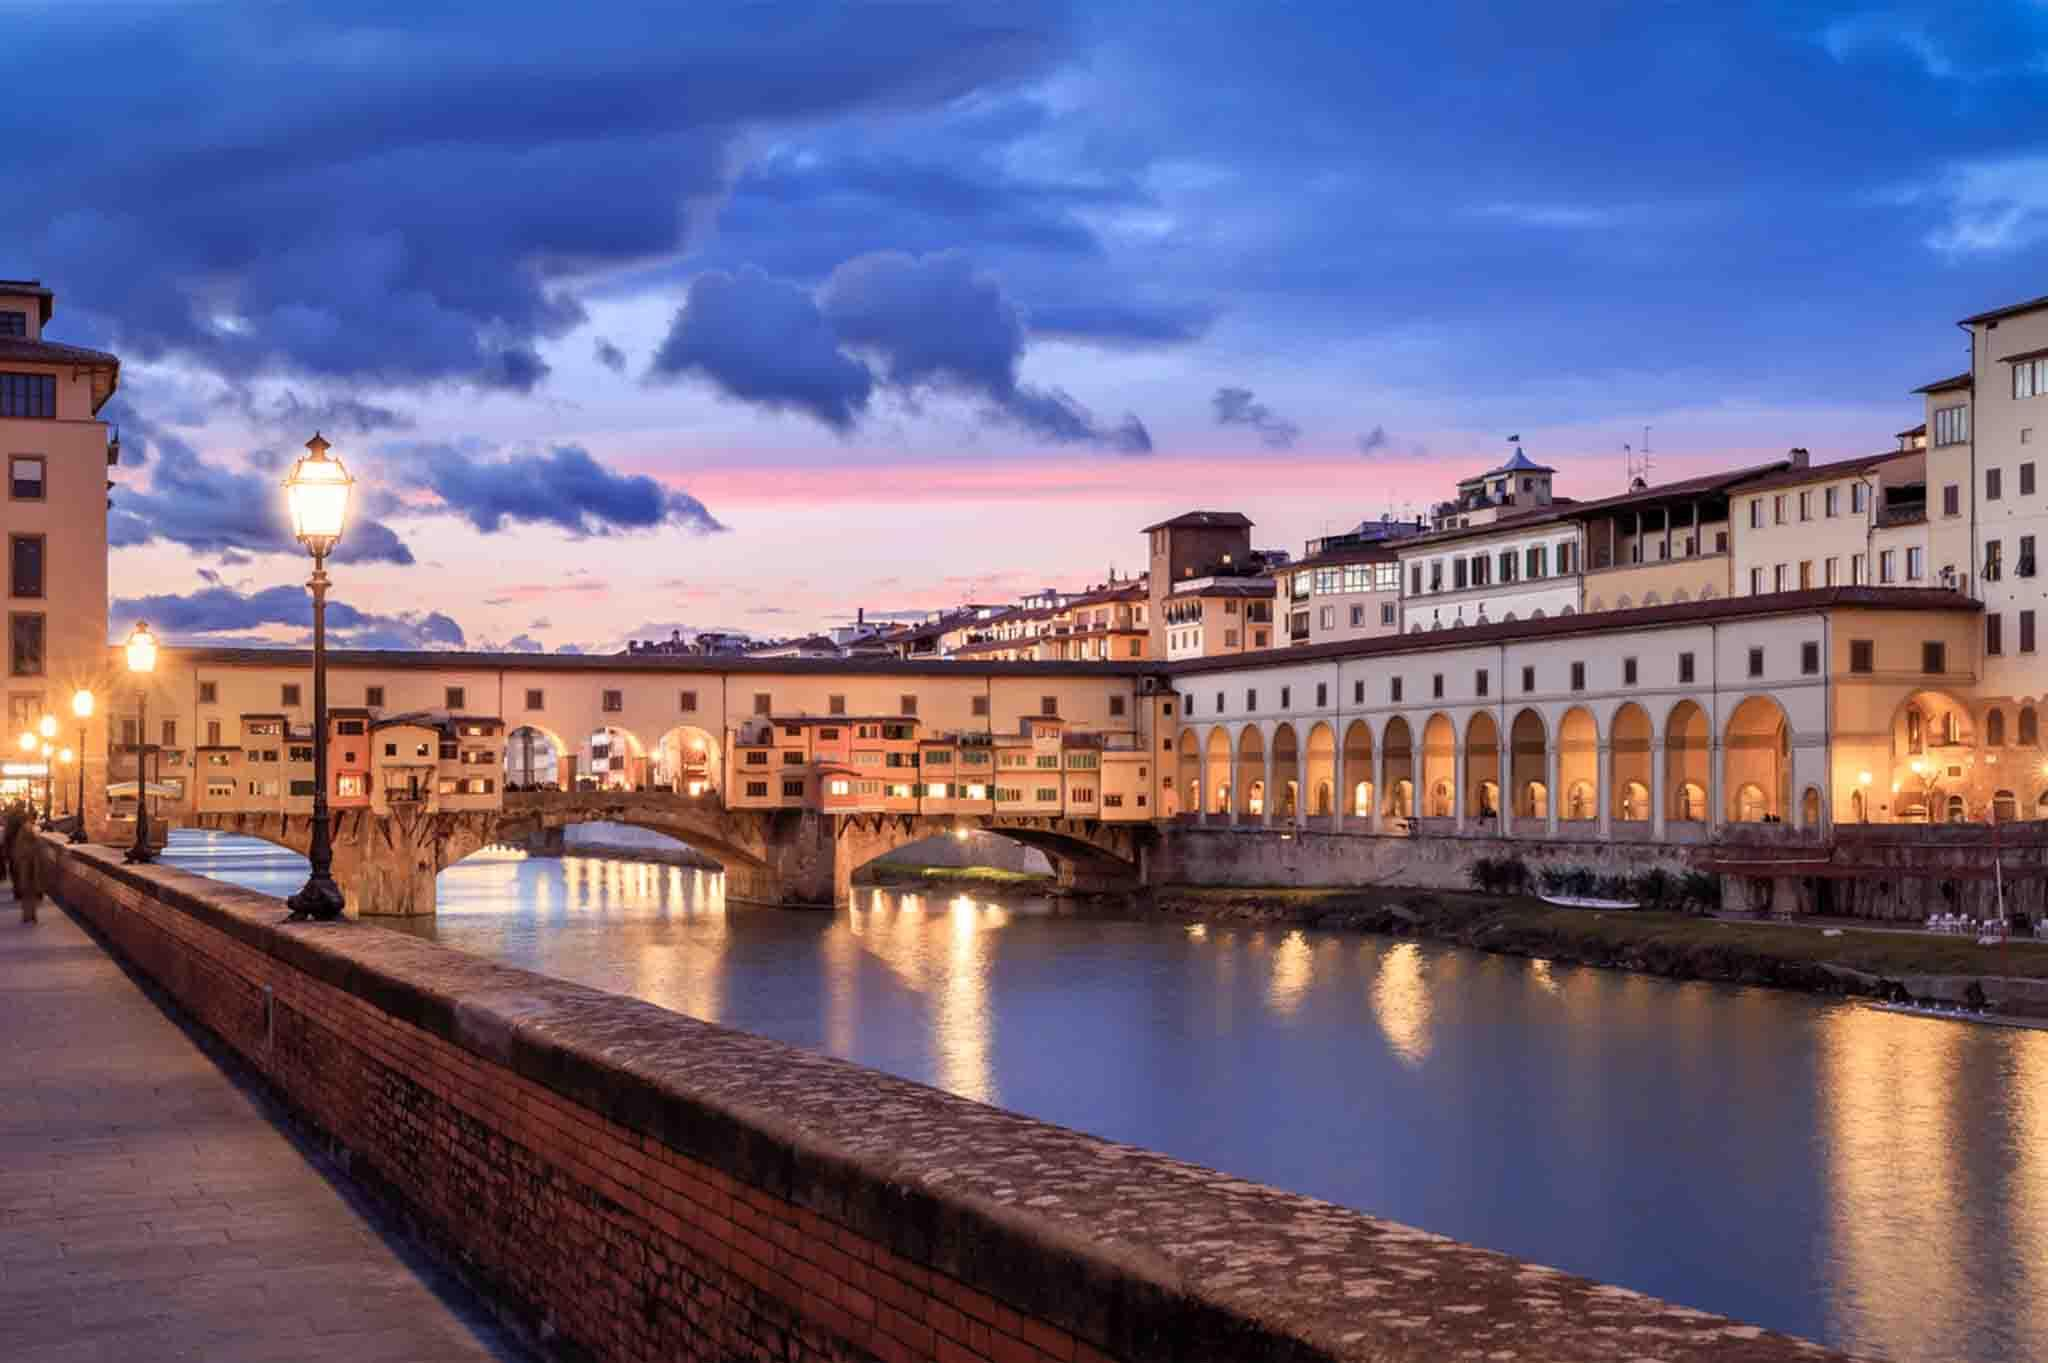 Florenz Wohnung, Haus: Immobilien Florenz | Sotheby's Realty - sothebys.photo 1